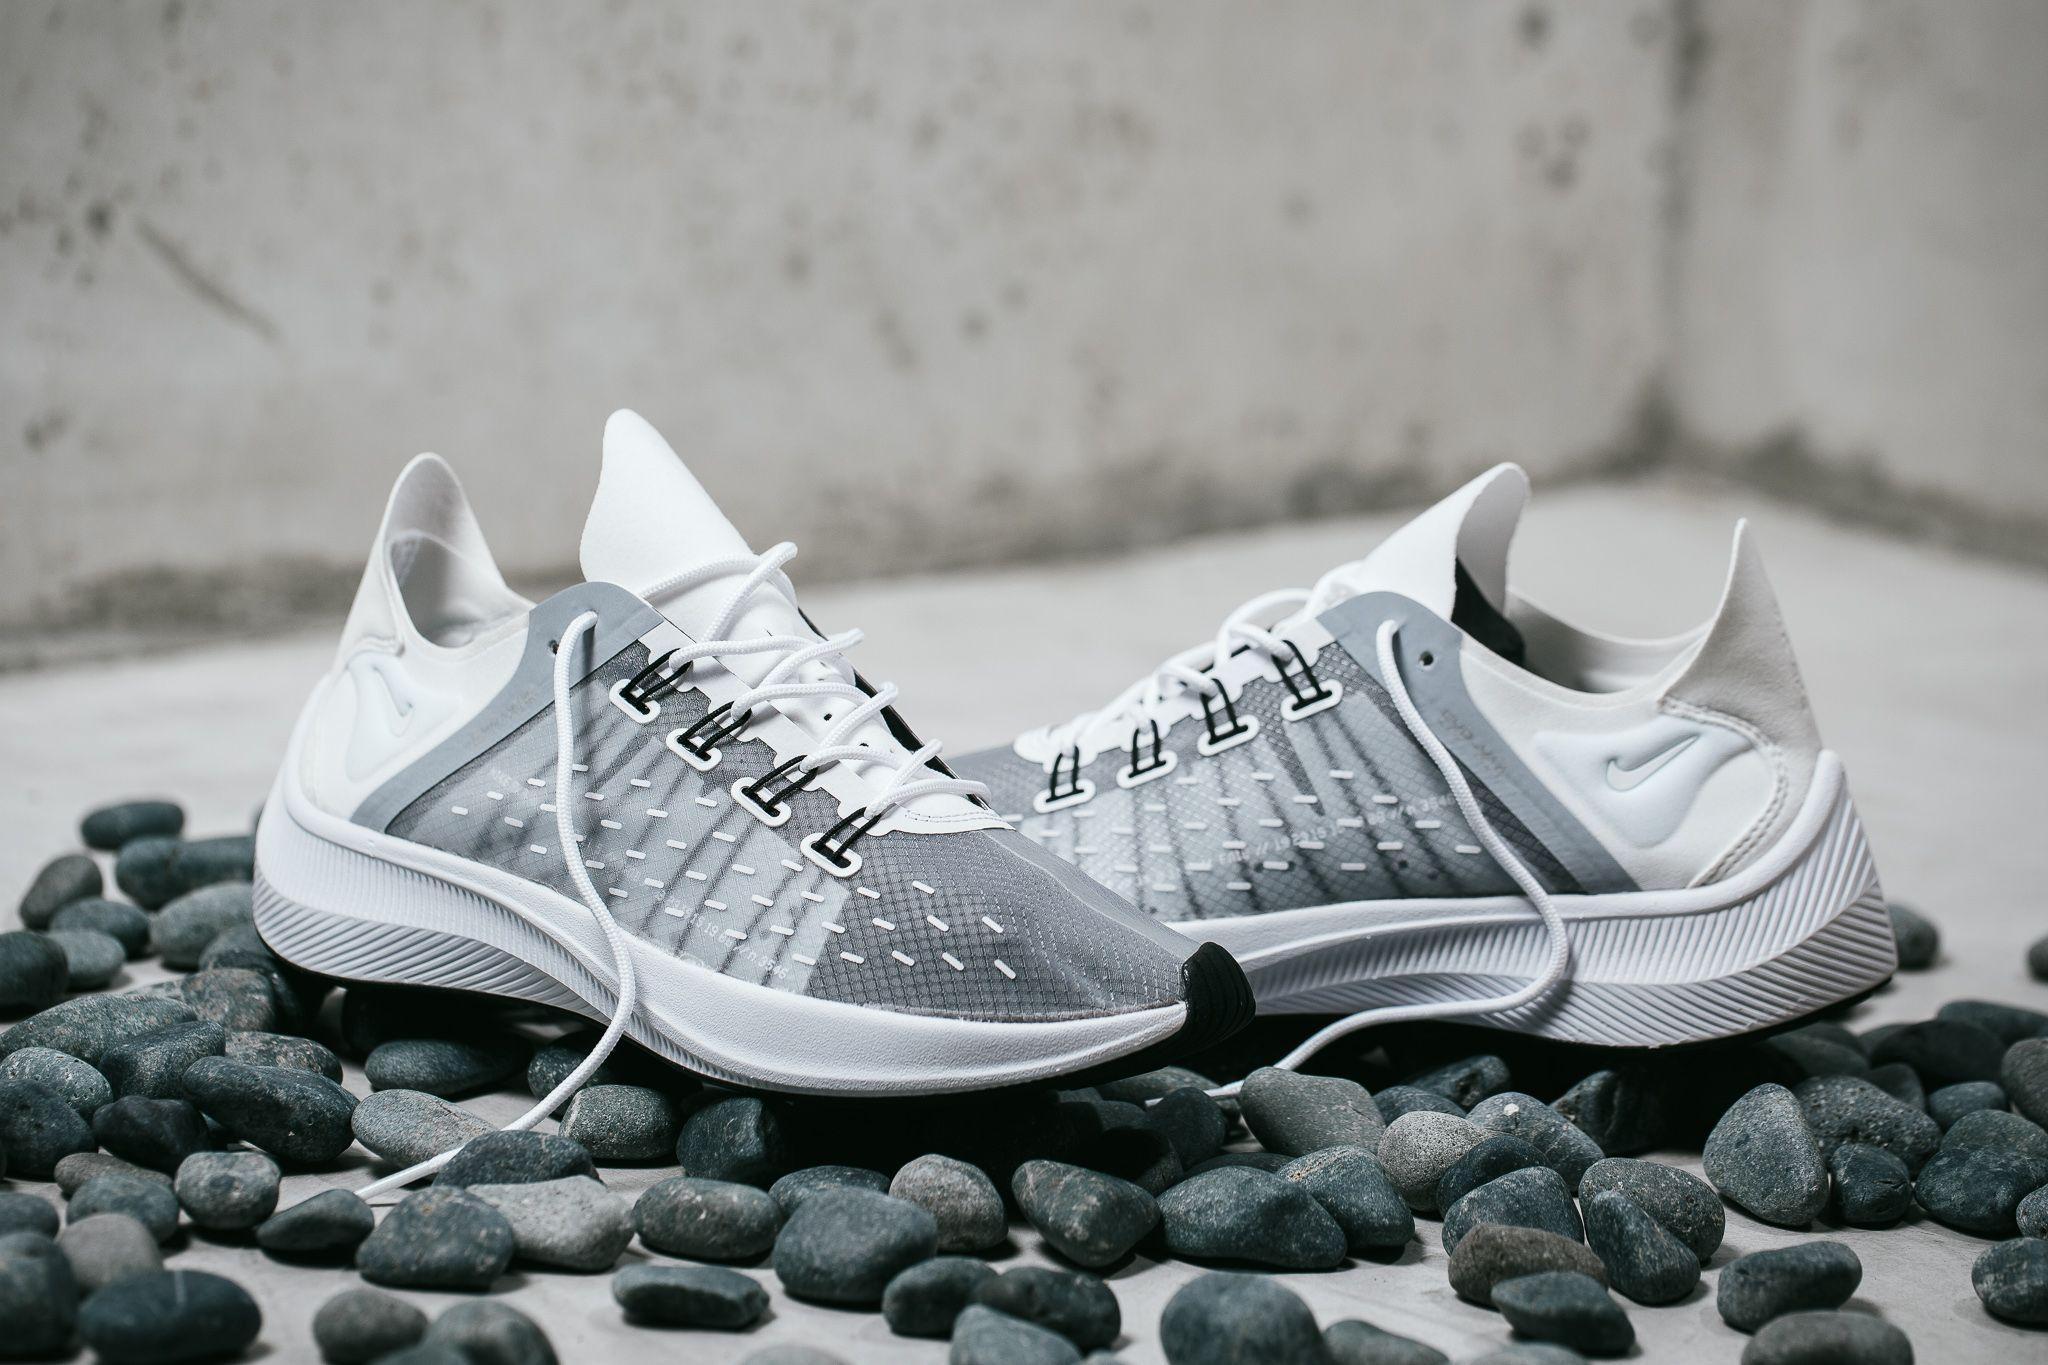 Nike,球鞋,WMNS NIKE EXP-14,2018新款球鞋,FRUITION, Nike React